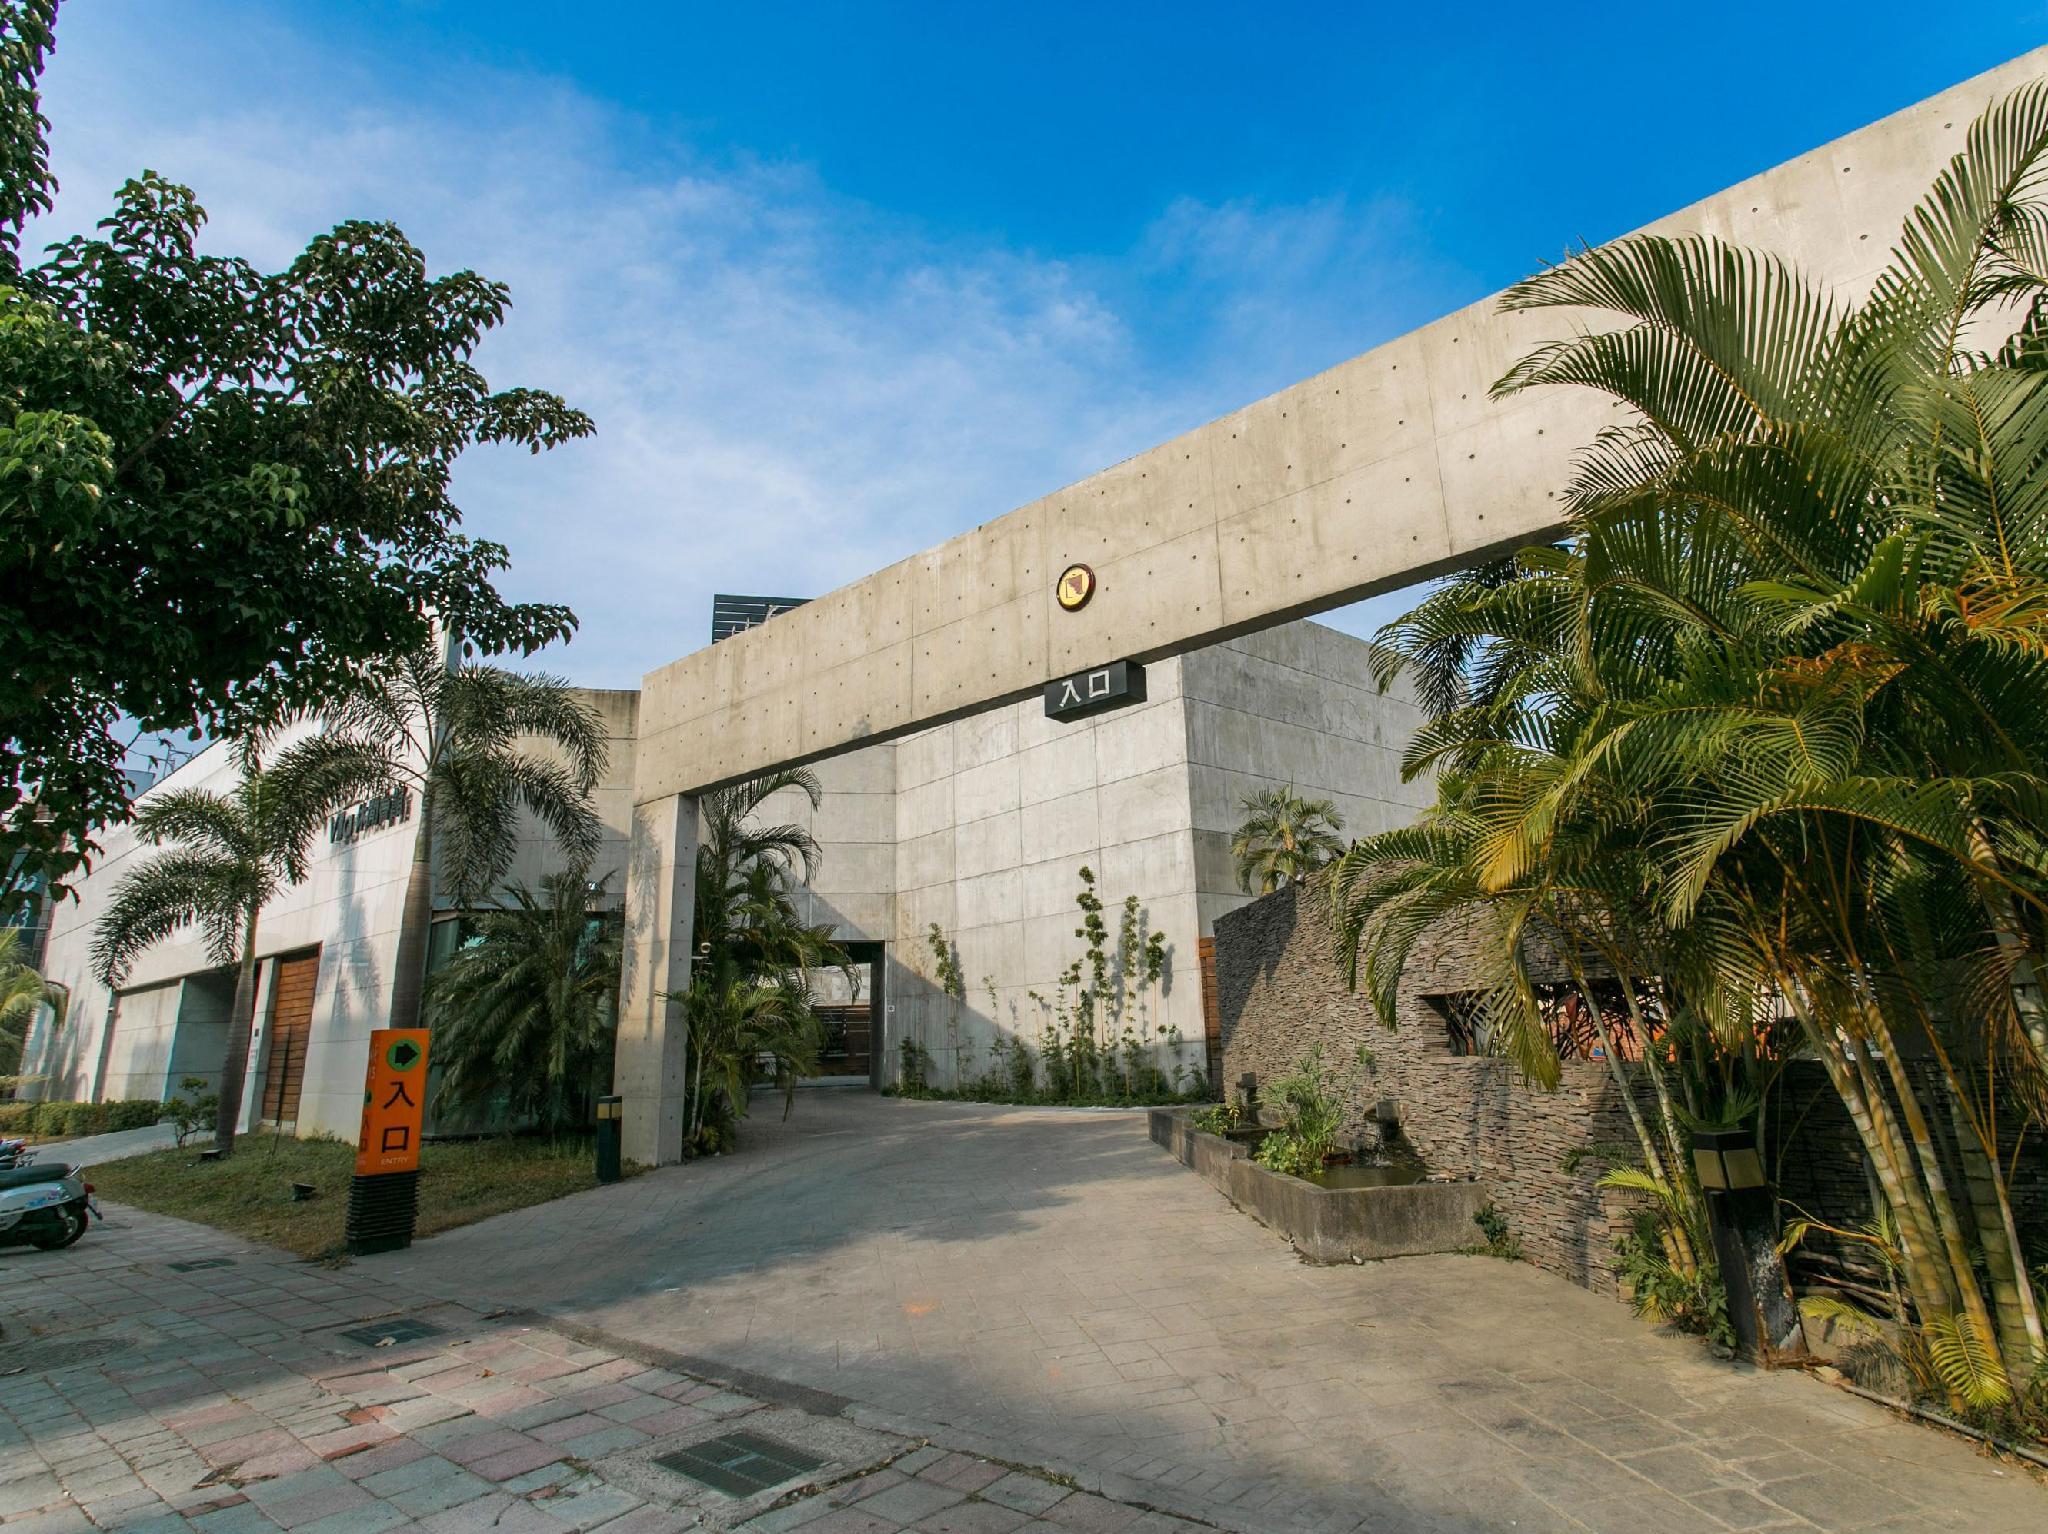 Zhen 13 Villa Motel